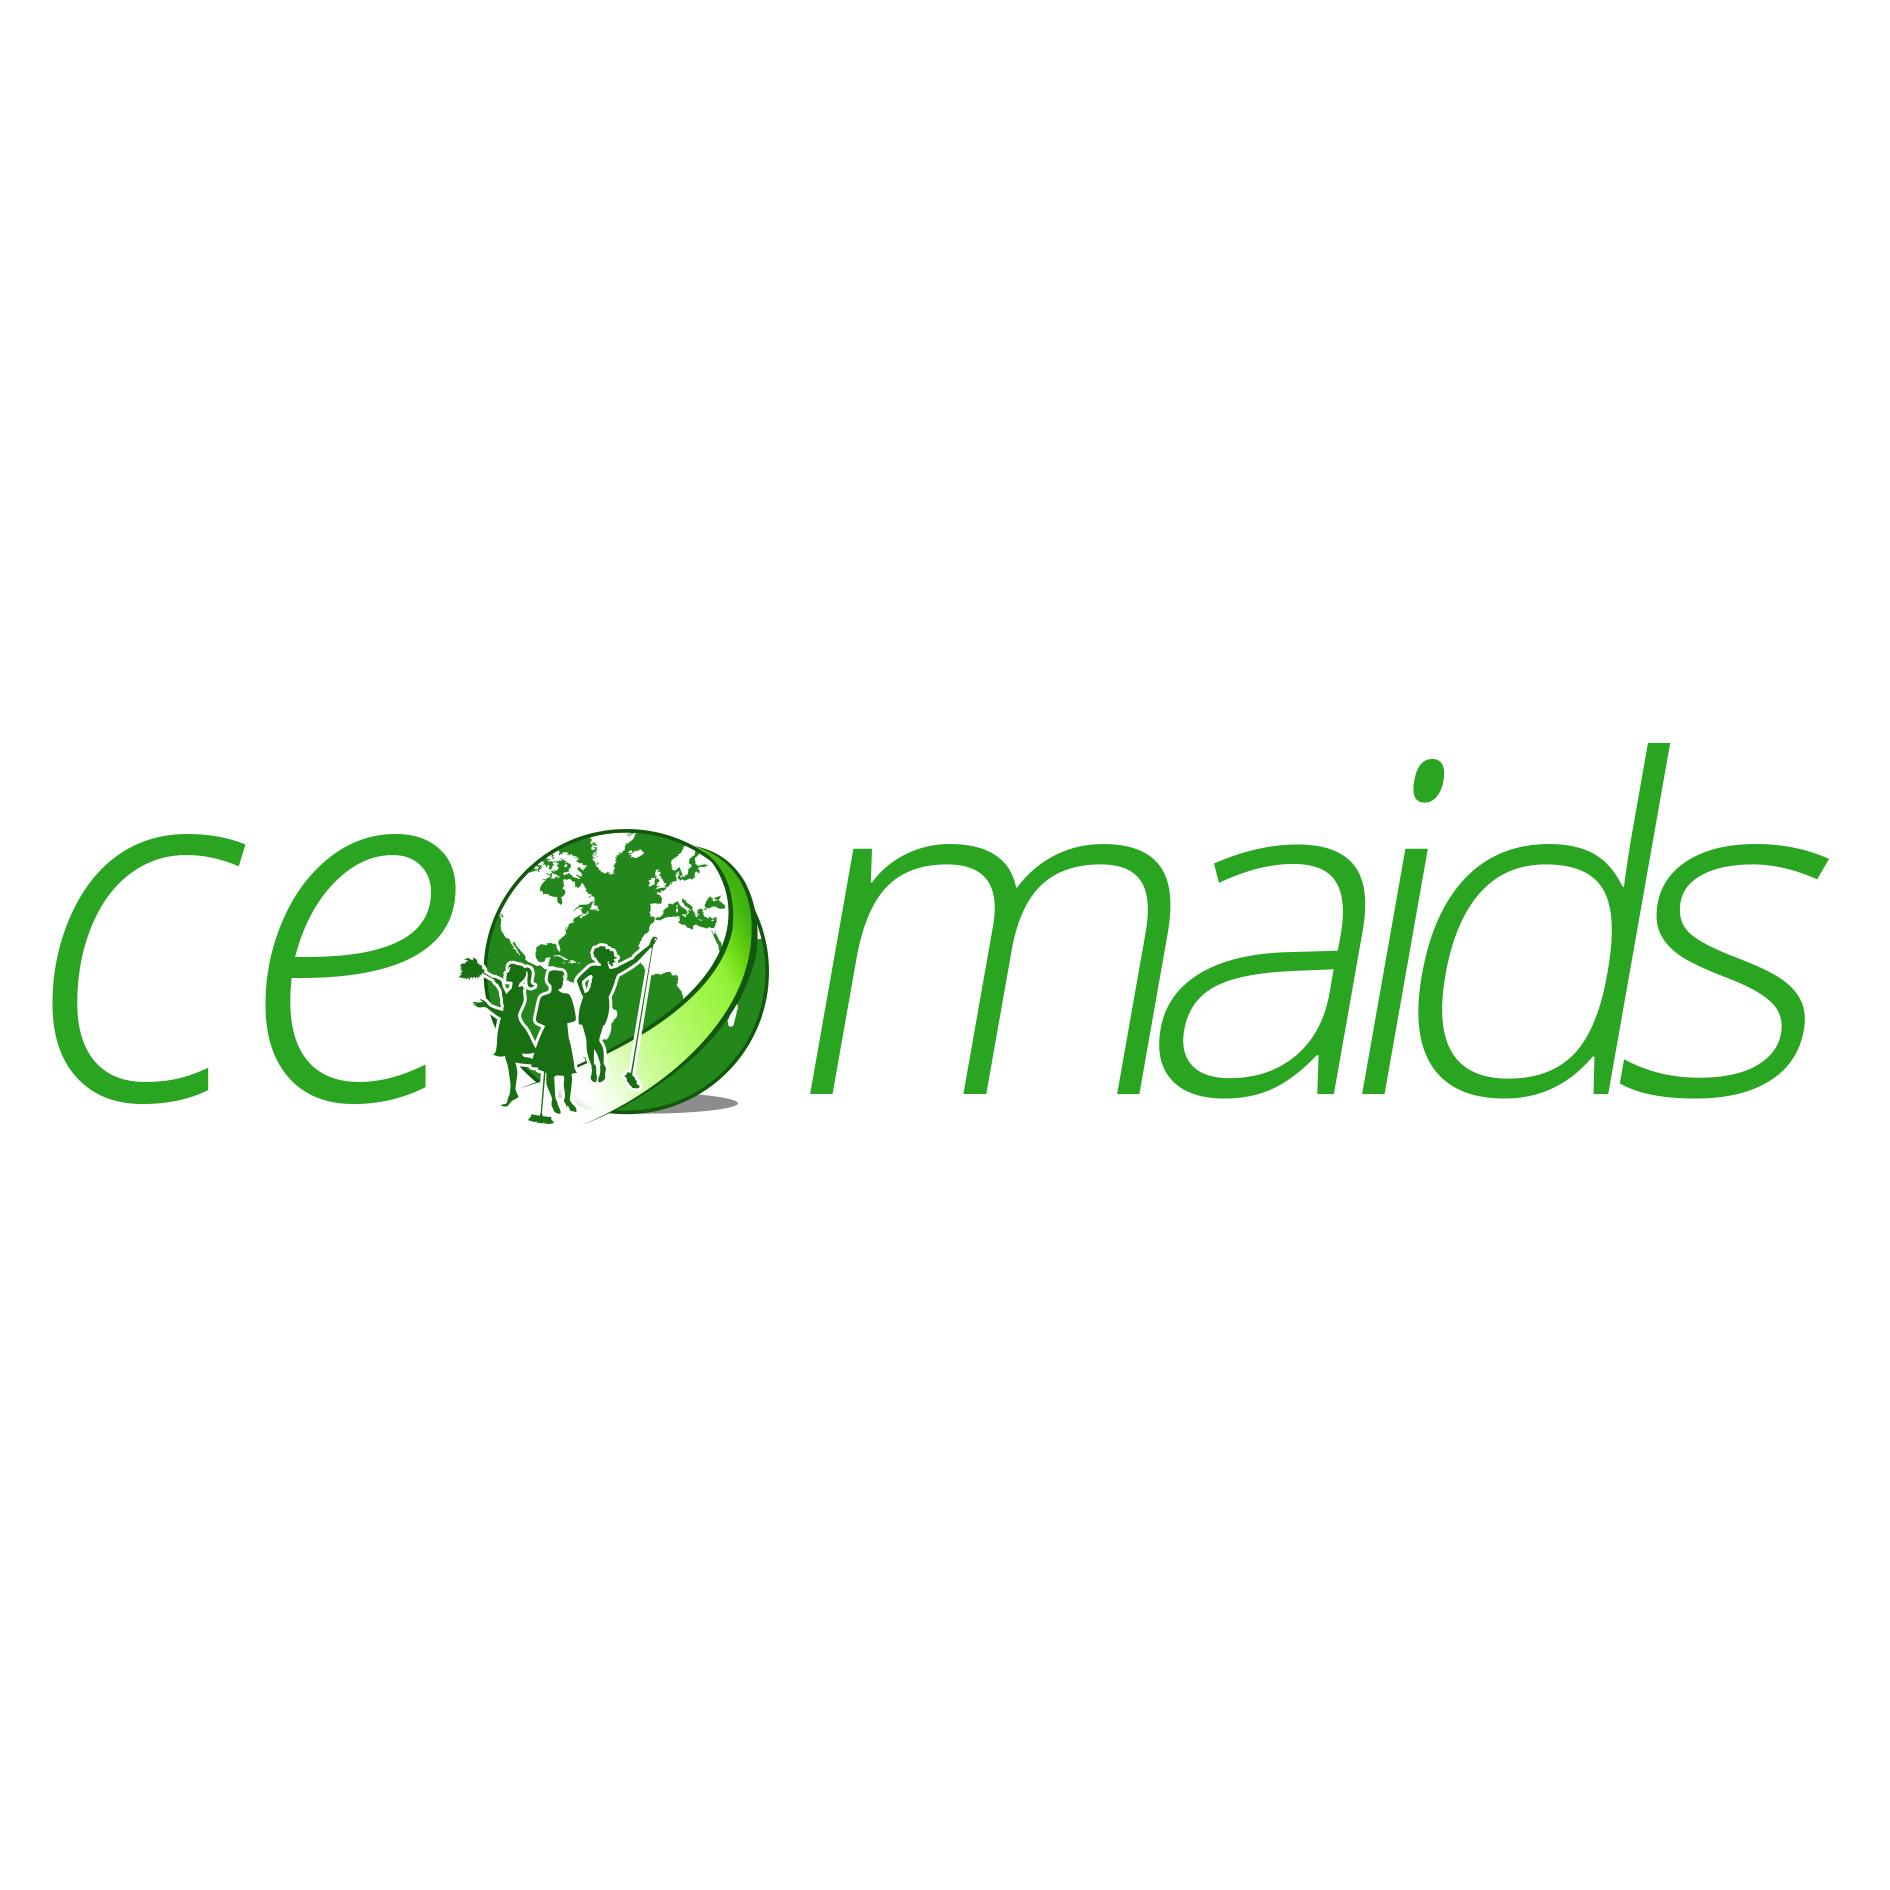 CEO Maids